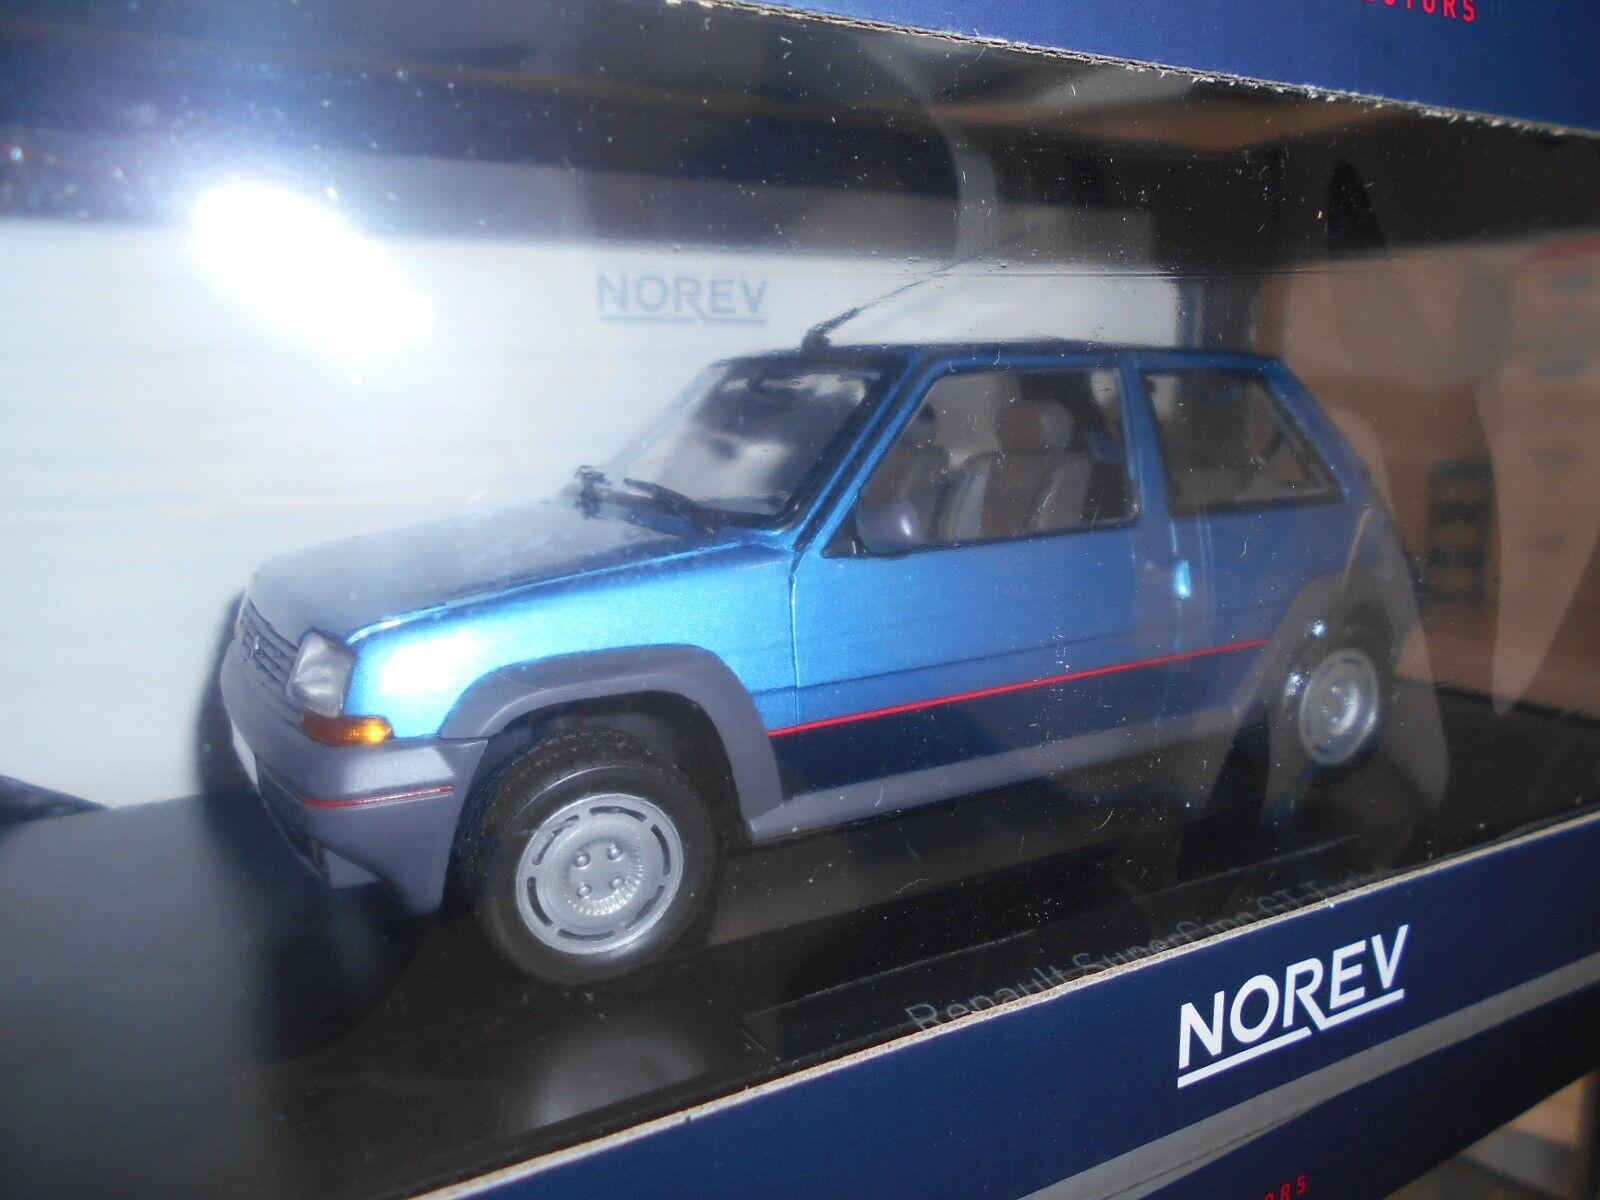 NV185207 by NOREV RENAULT SUPERCINQ GT TURBO 1 18